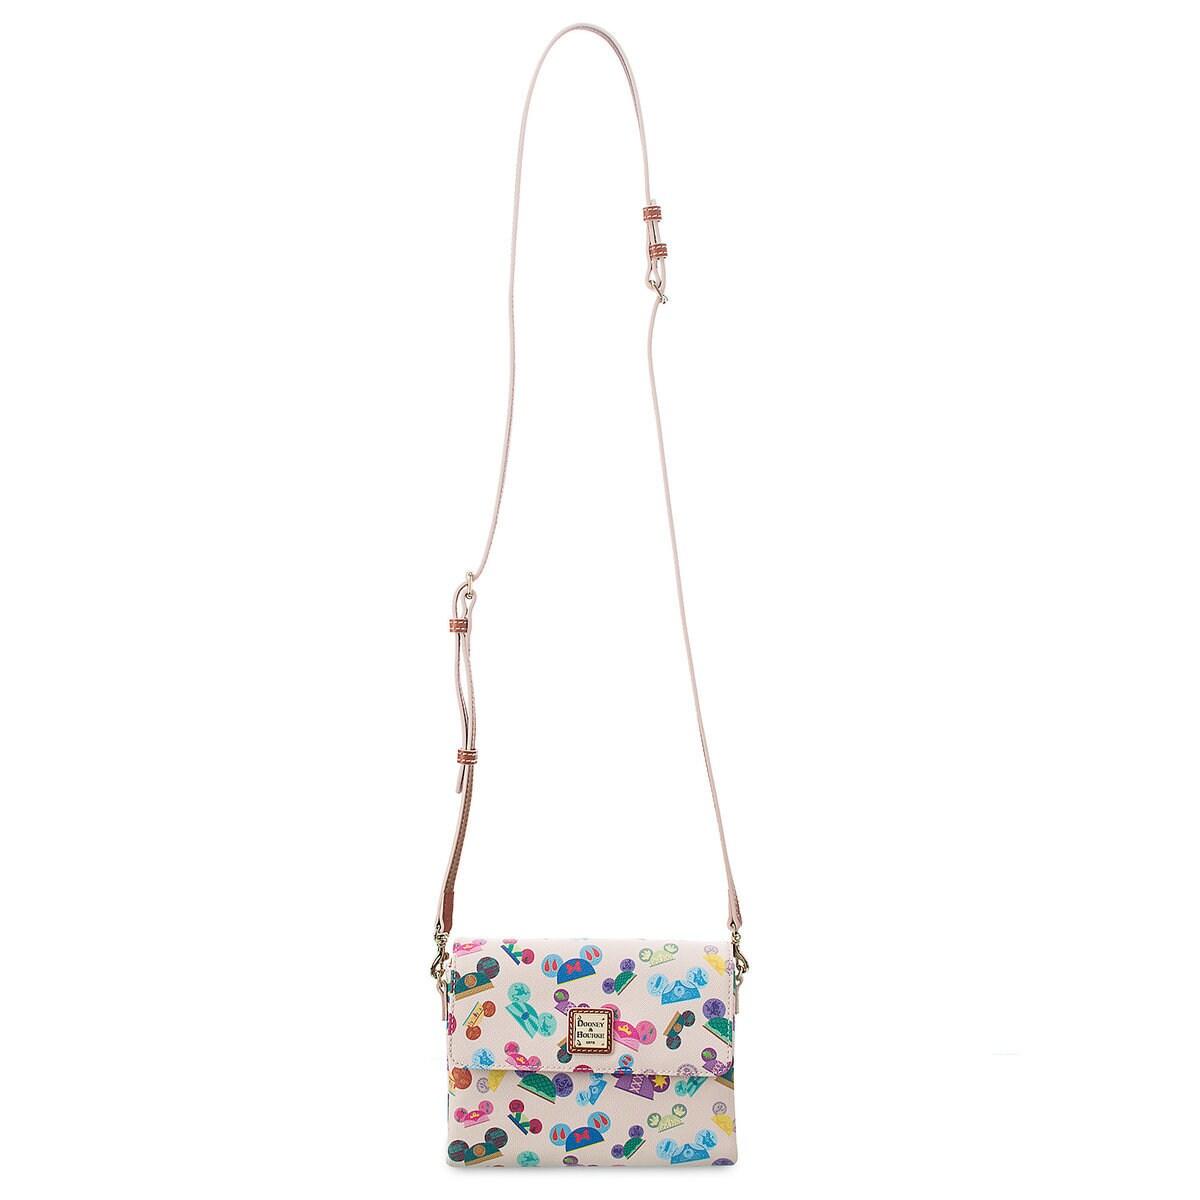 17762a9aff2 Product Image of I Am Princess Crossbody Bag by Dooney   Bourke   1